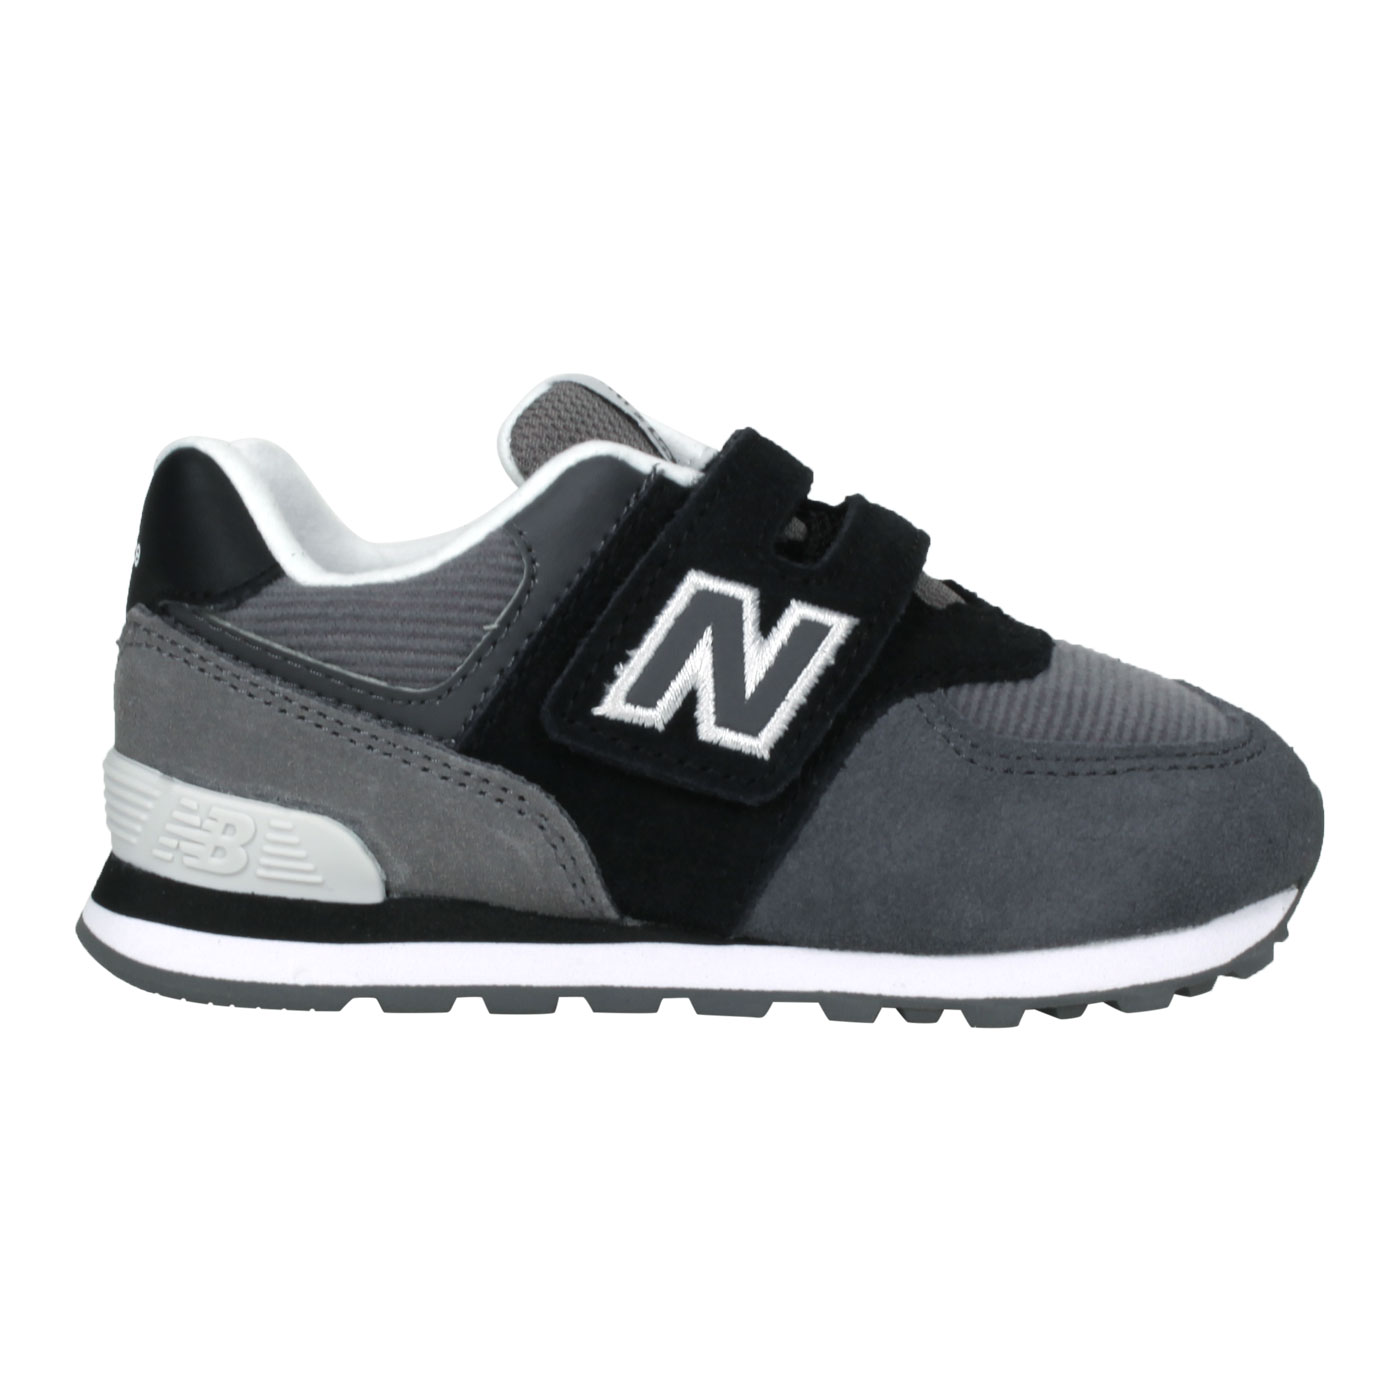 NEW BALANCE 小童休閒運動鞋-WIDE IV574WR1 - 黑灰白